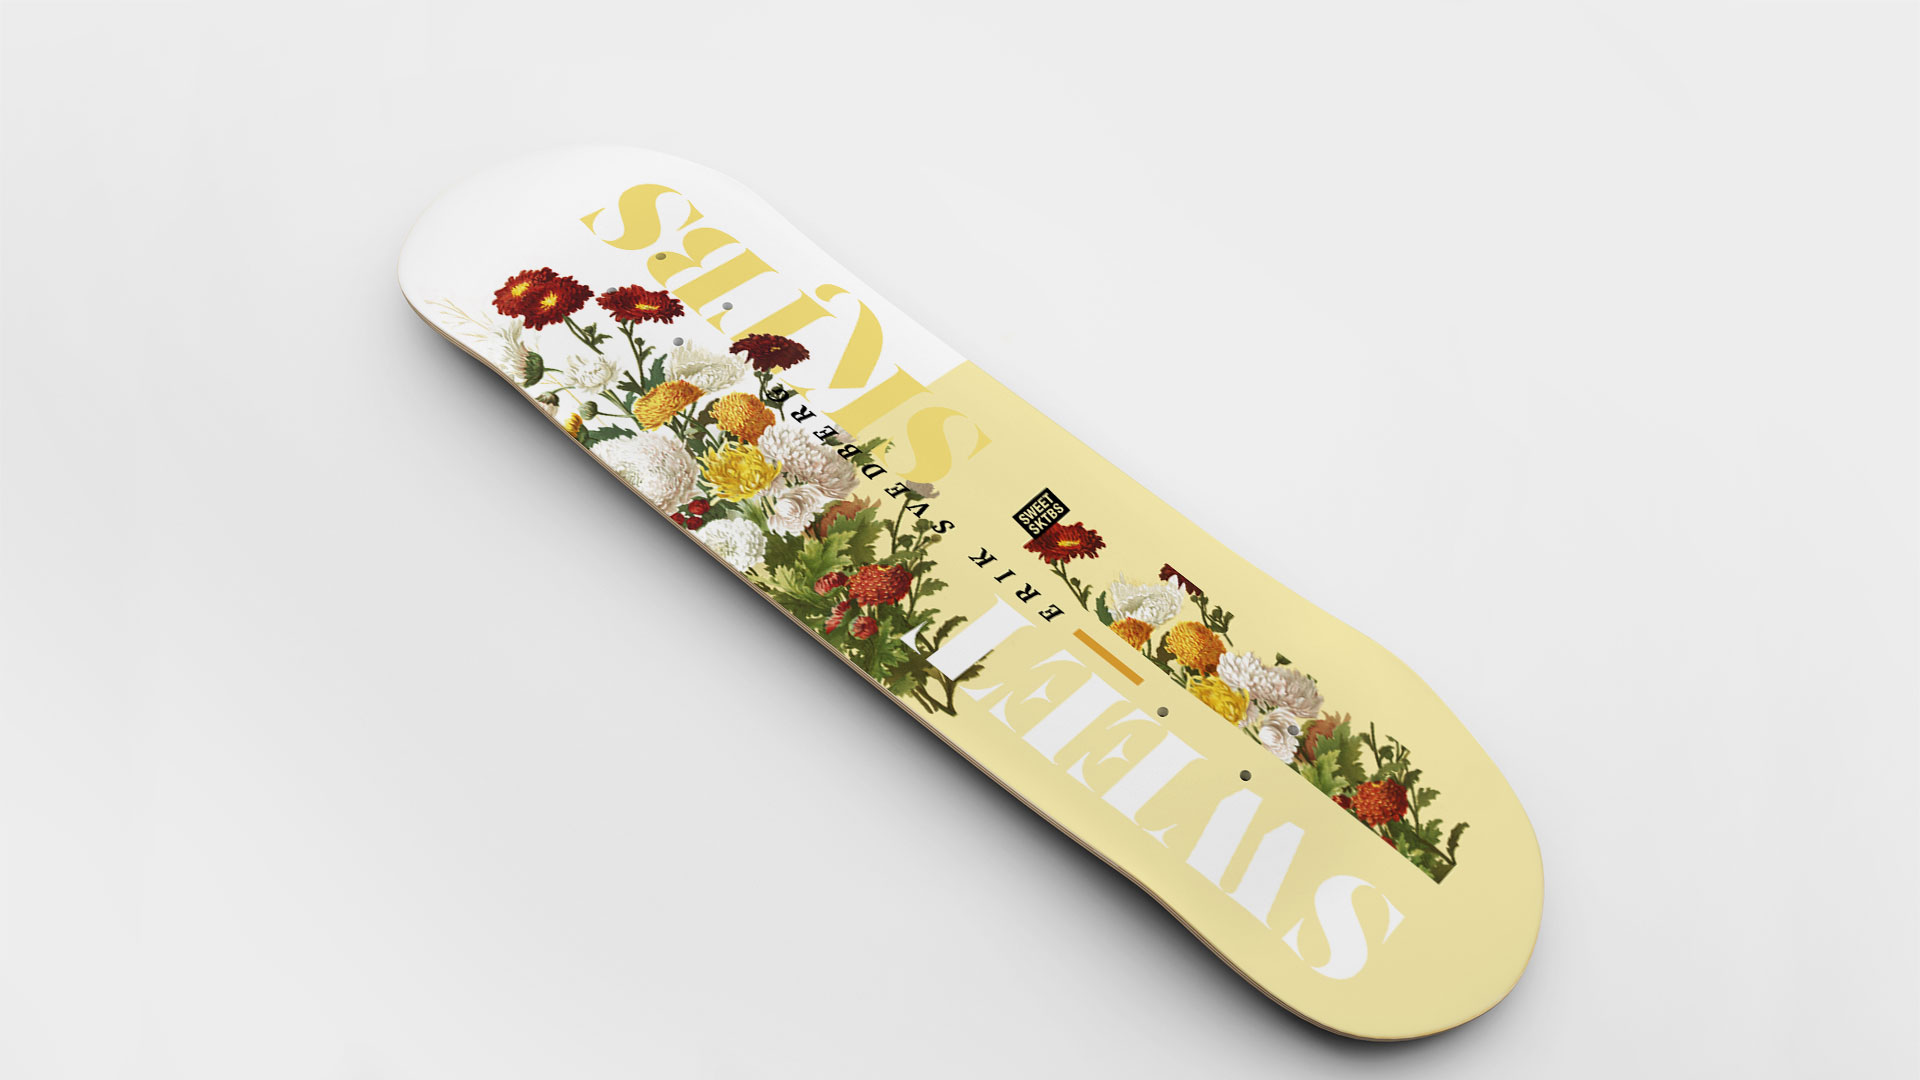 9_deck_skateboards_graphicdesign